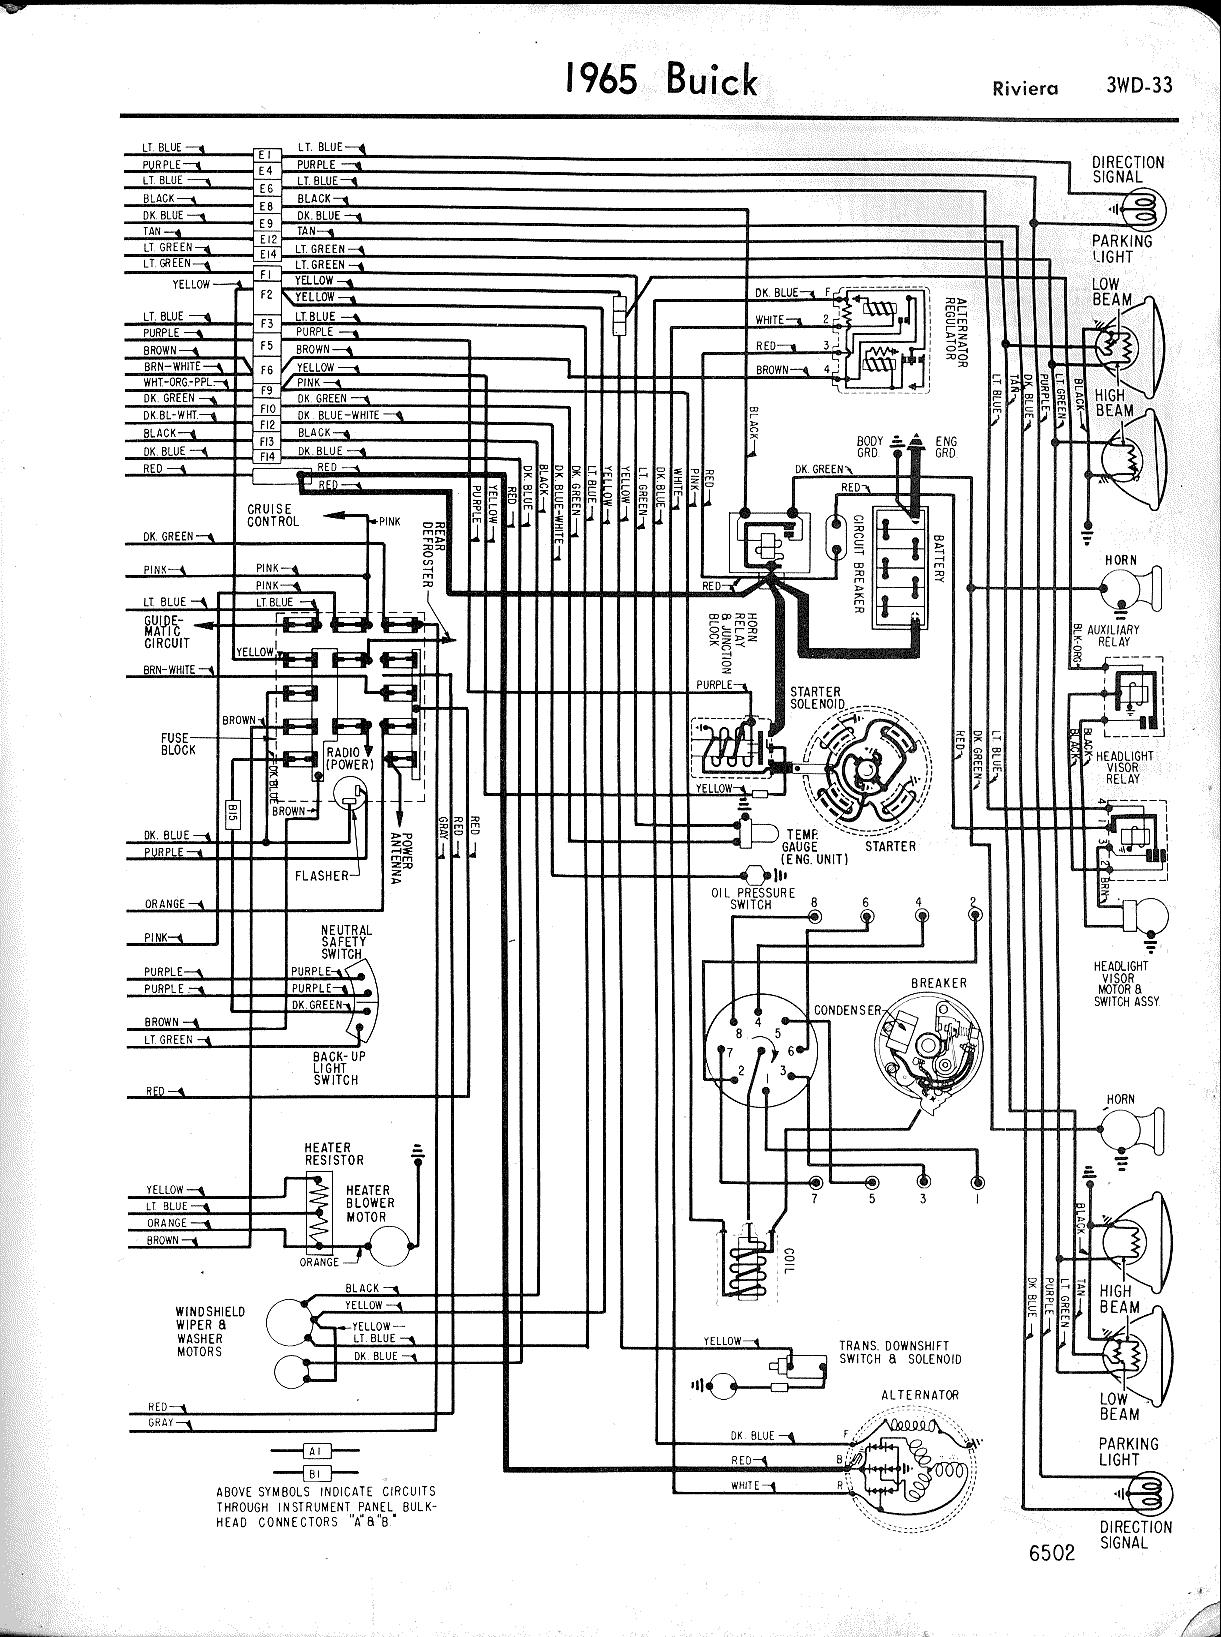 Astounding 1957 Dodge Wiring Diagram Wiring Diagram Data Schema Wiring Cloud Timewinrebemohammedshrineorg